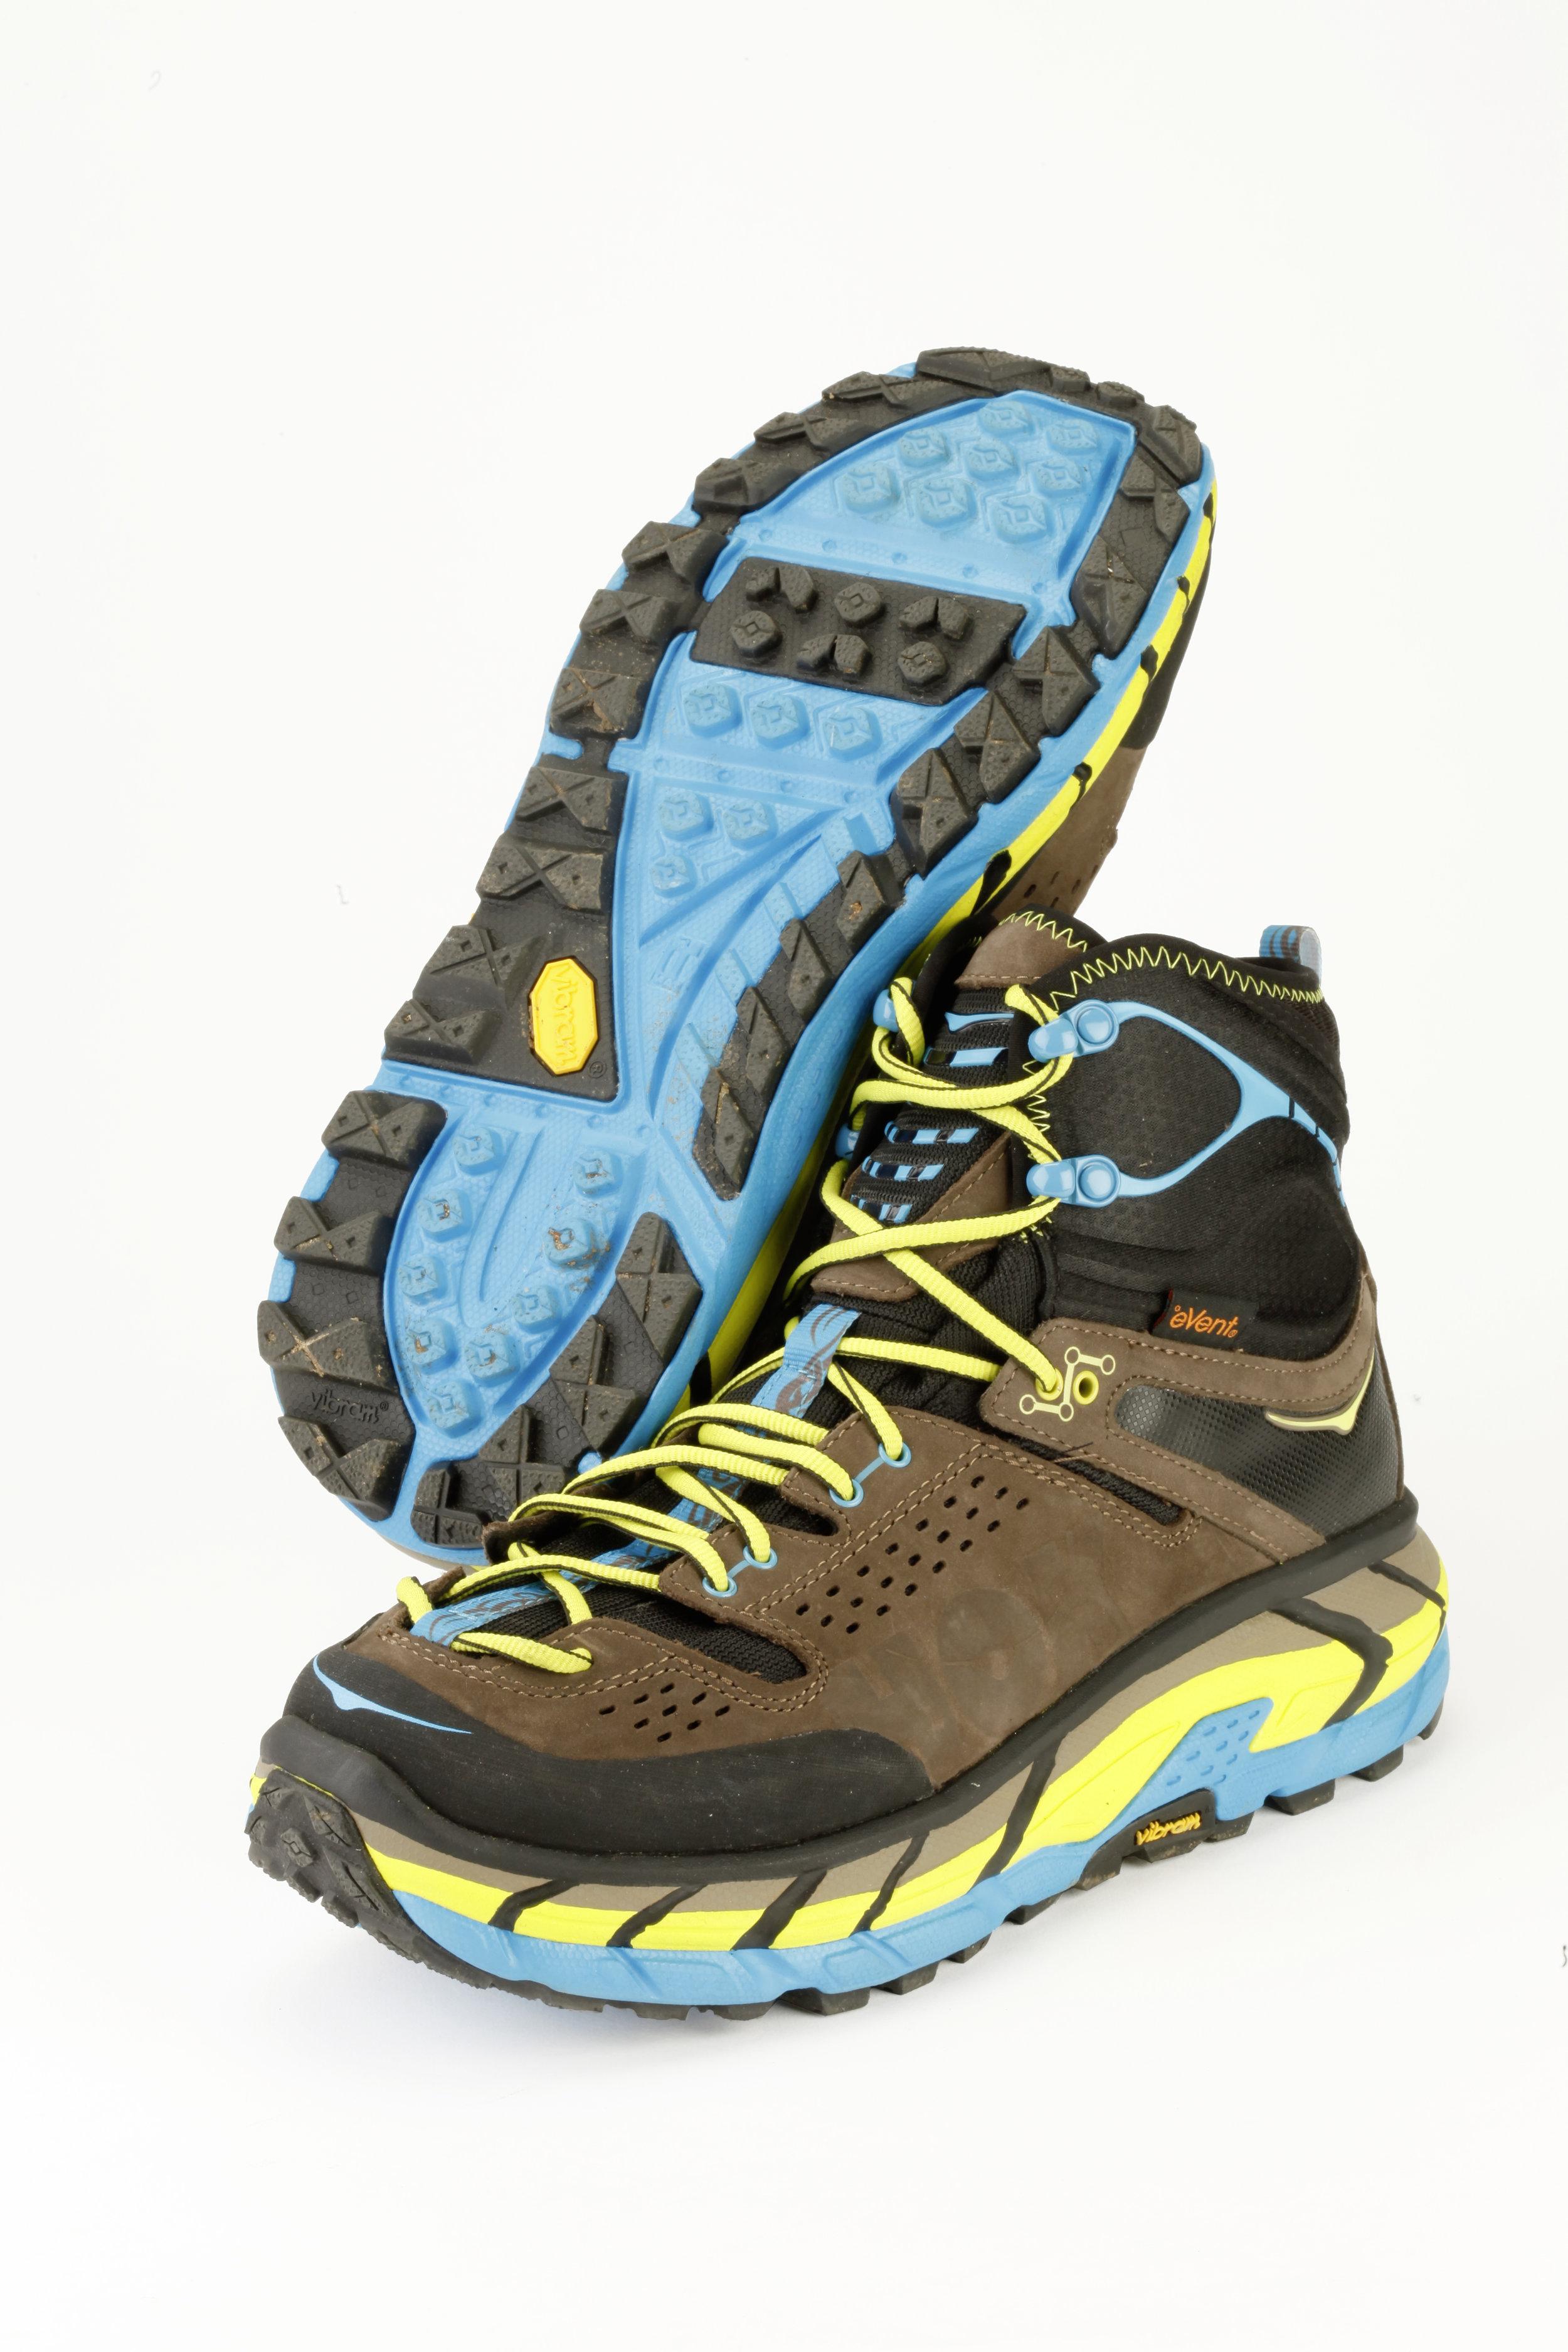 the latest e5f82 8f624 HOKA ONE ONE Tor Ultra Hi WP walking boots — Live for the ...